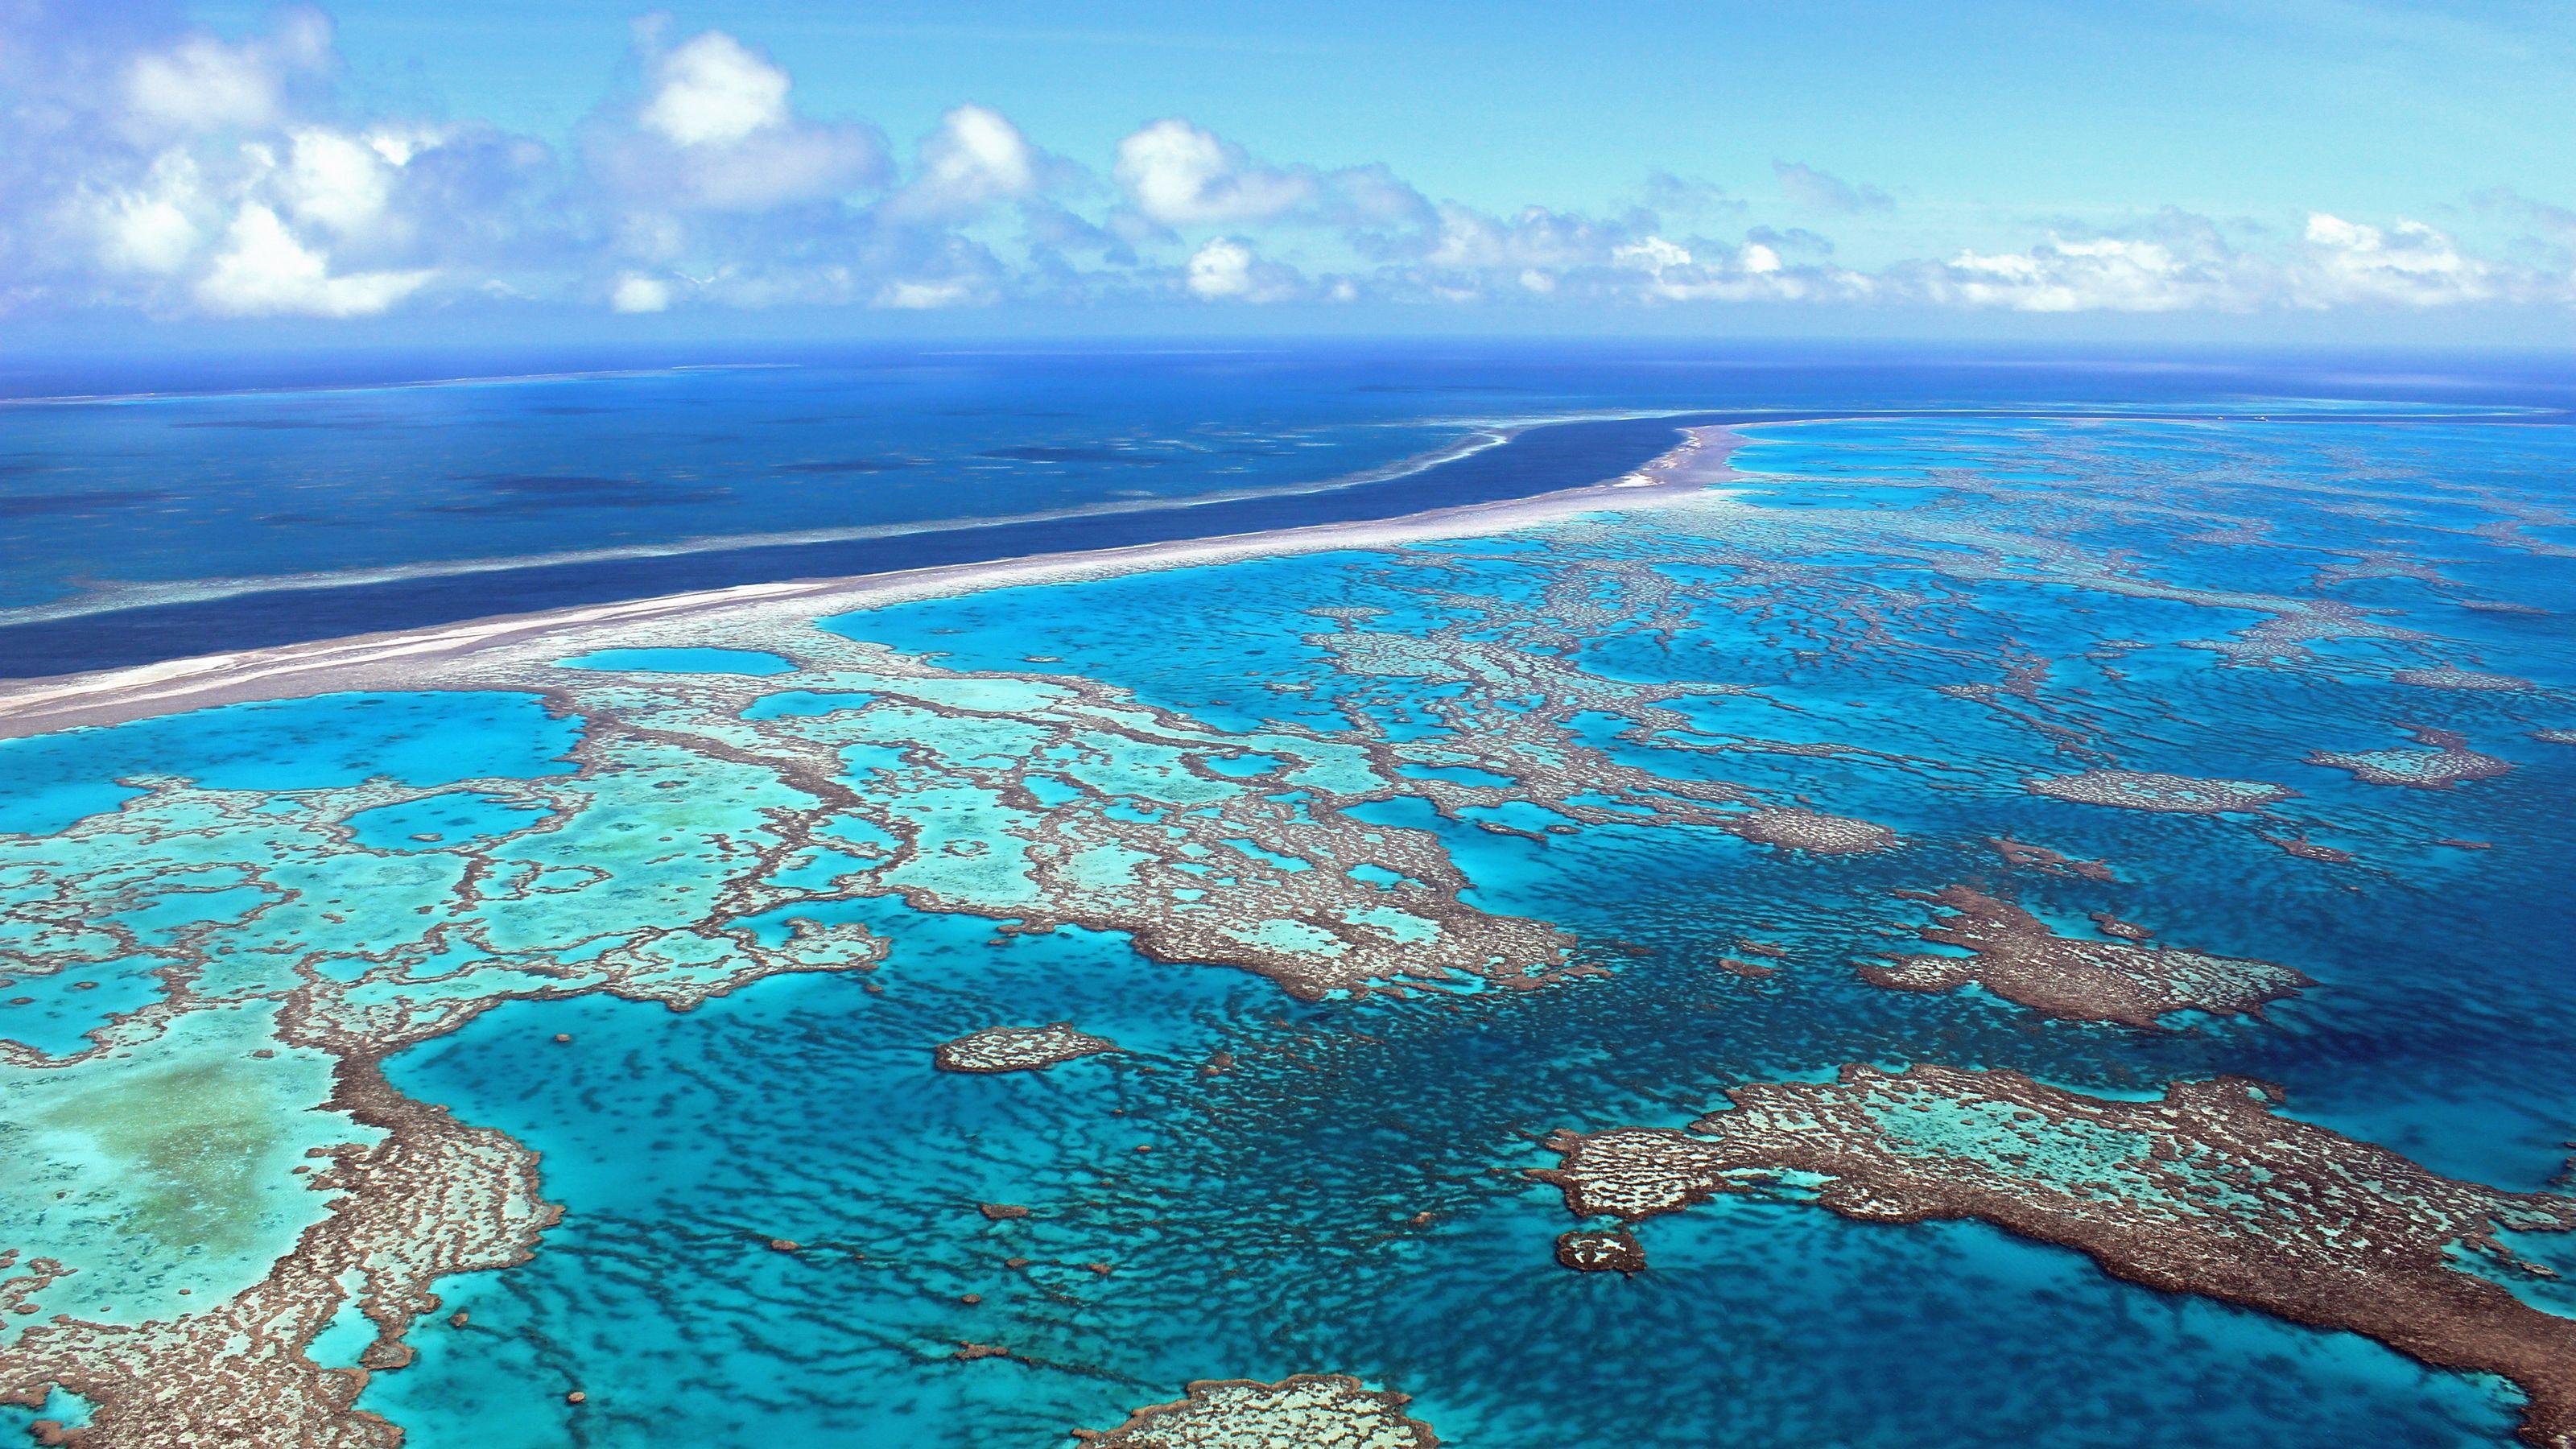 Whitsundays & Great Barrier Reef Scenic Flight